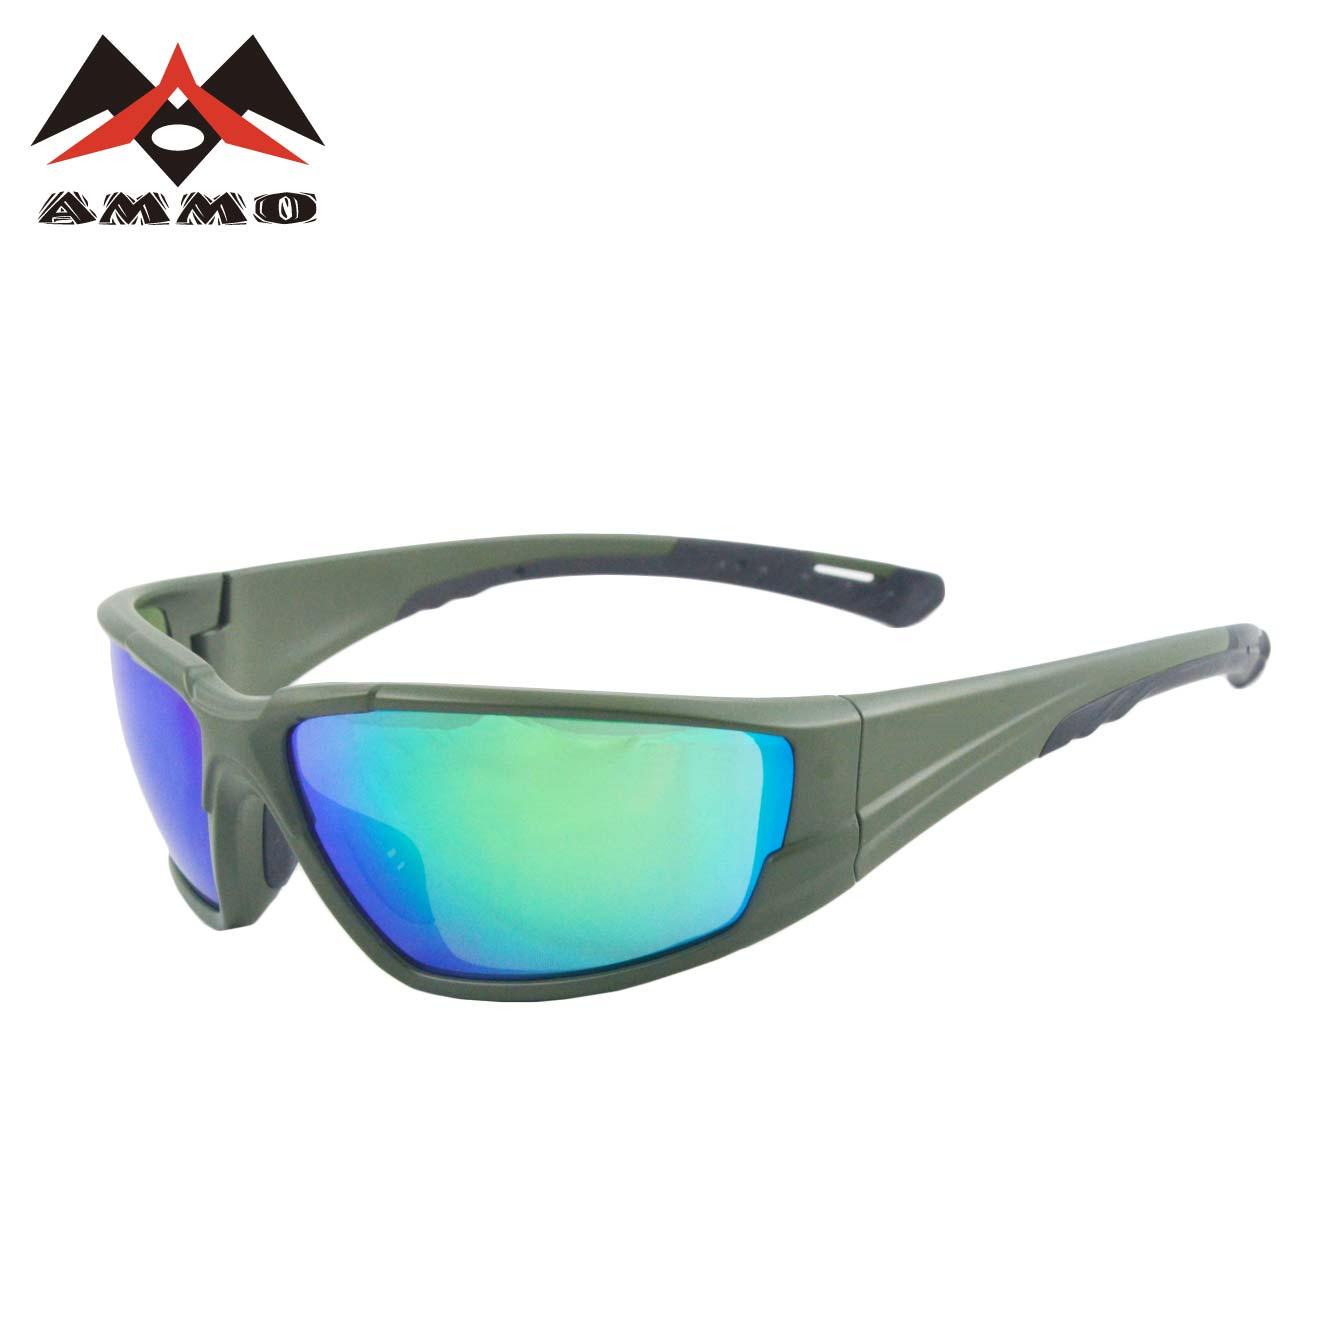 08bc3a3901 Taiwan Uv400 Sunglasses